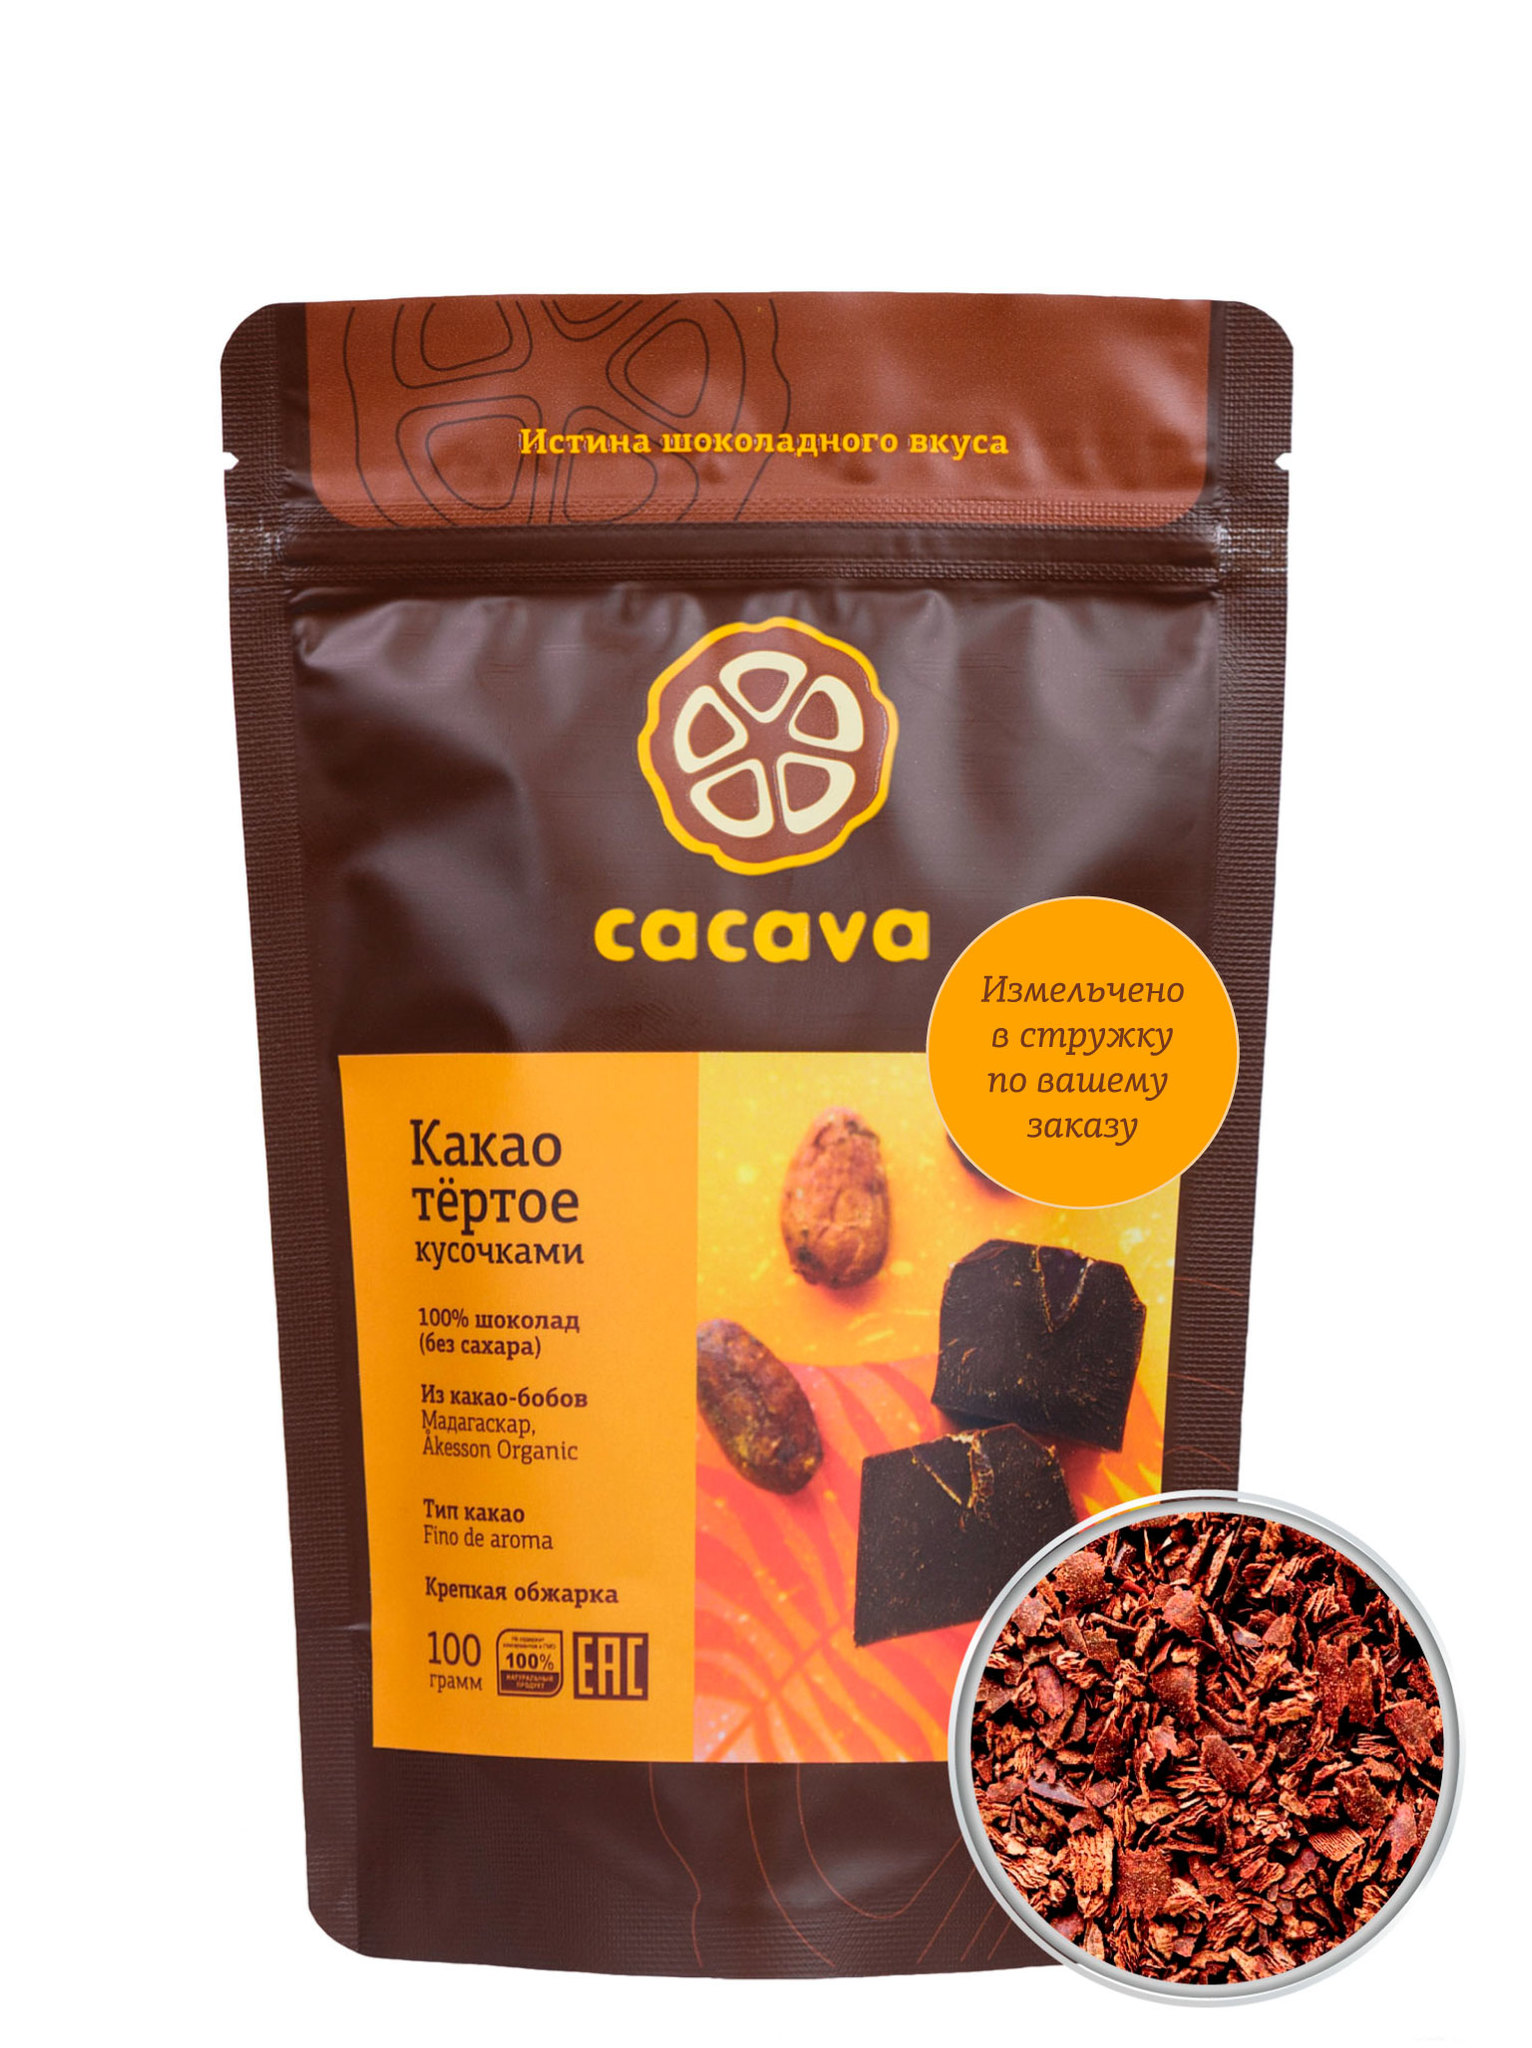 Какао тёртое в стружке (Мадагаскар, Åkesson), упаковка 100 грамм